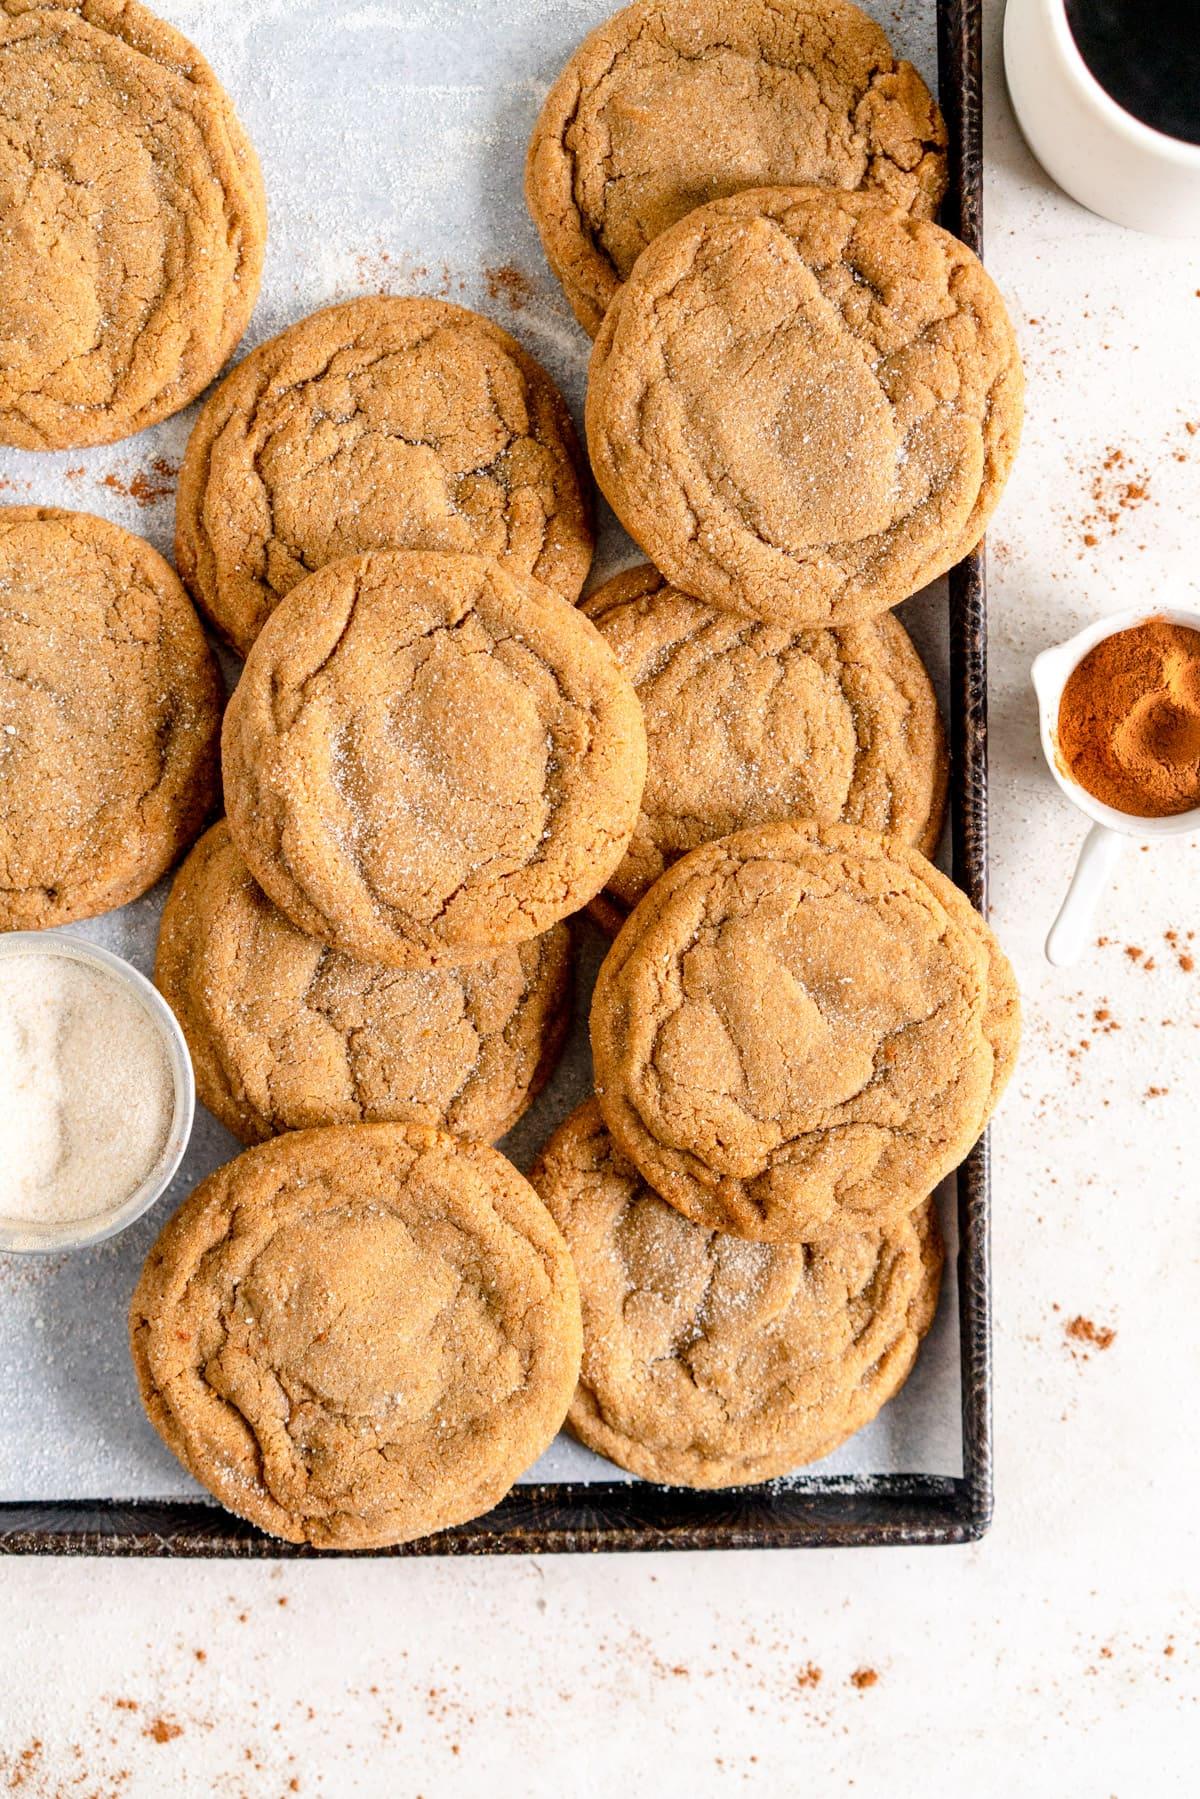 Ginger Molasses sugar cookies on sheet pan